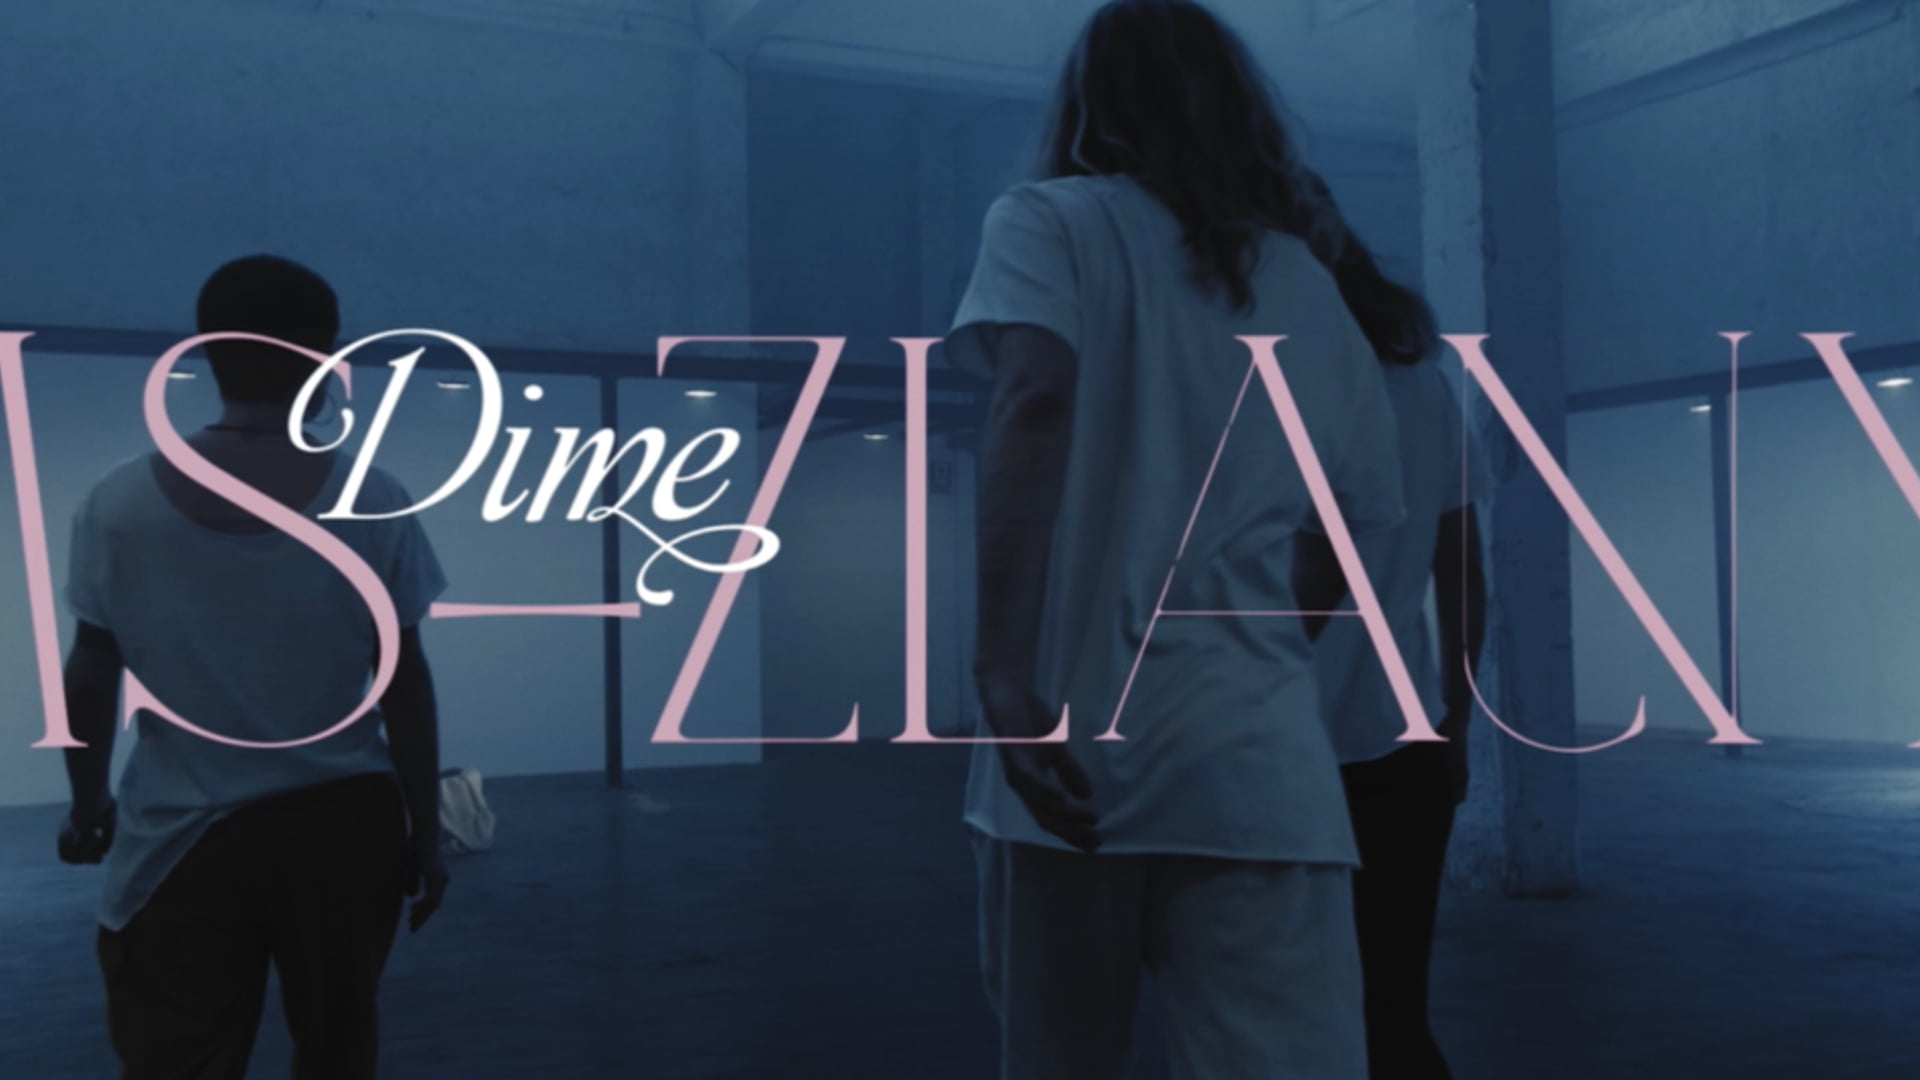 MS ZLANY - Dime